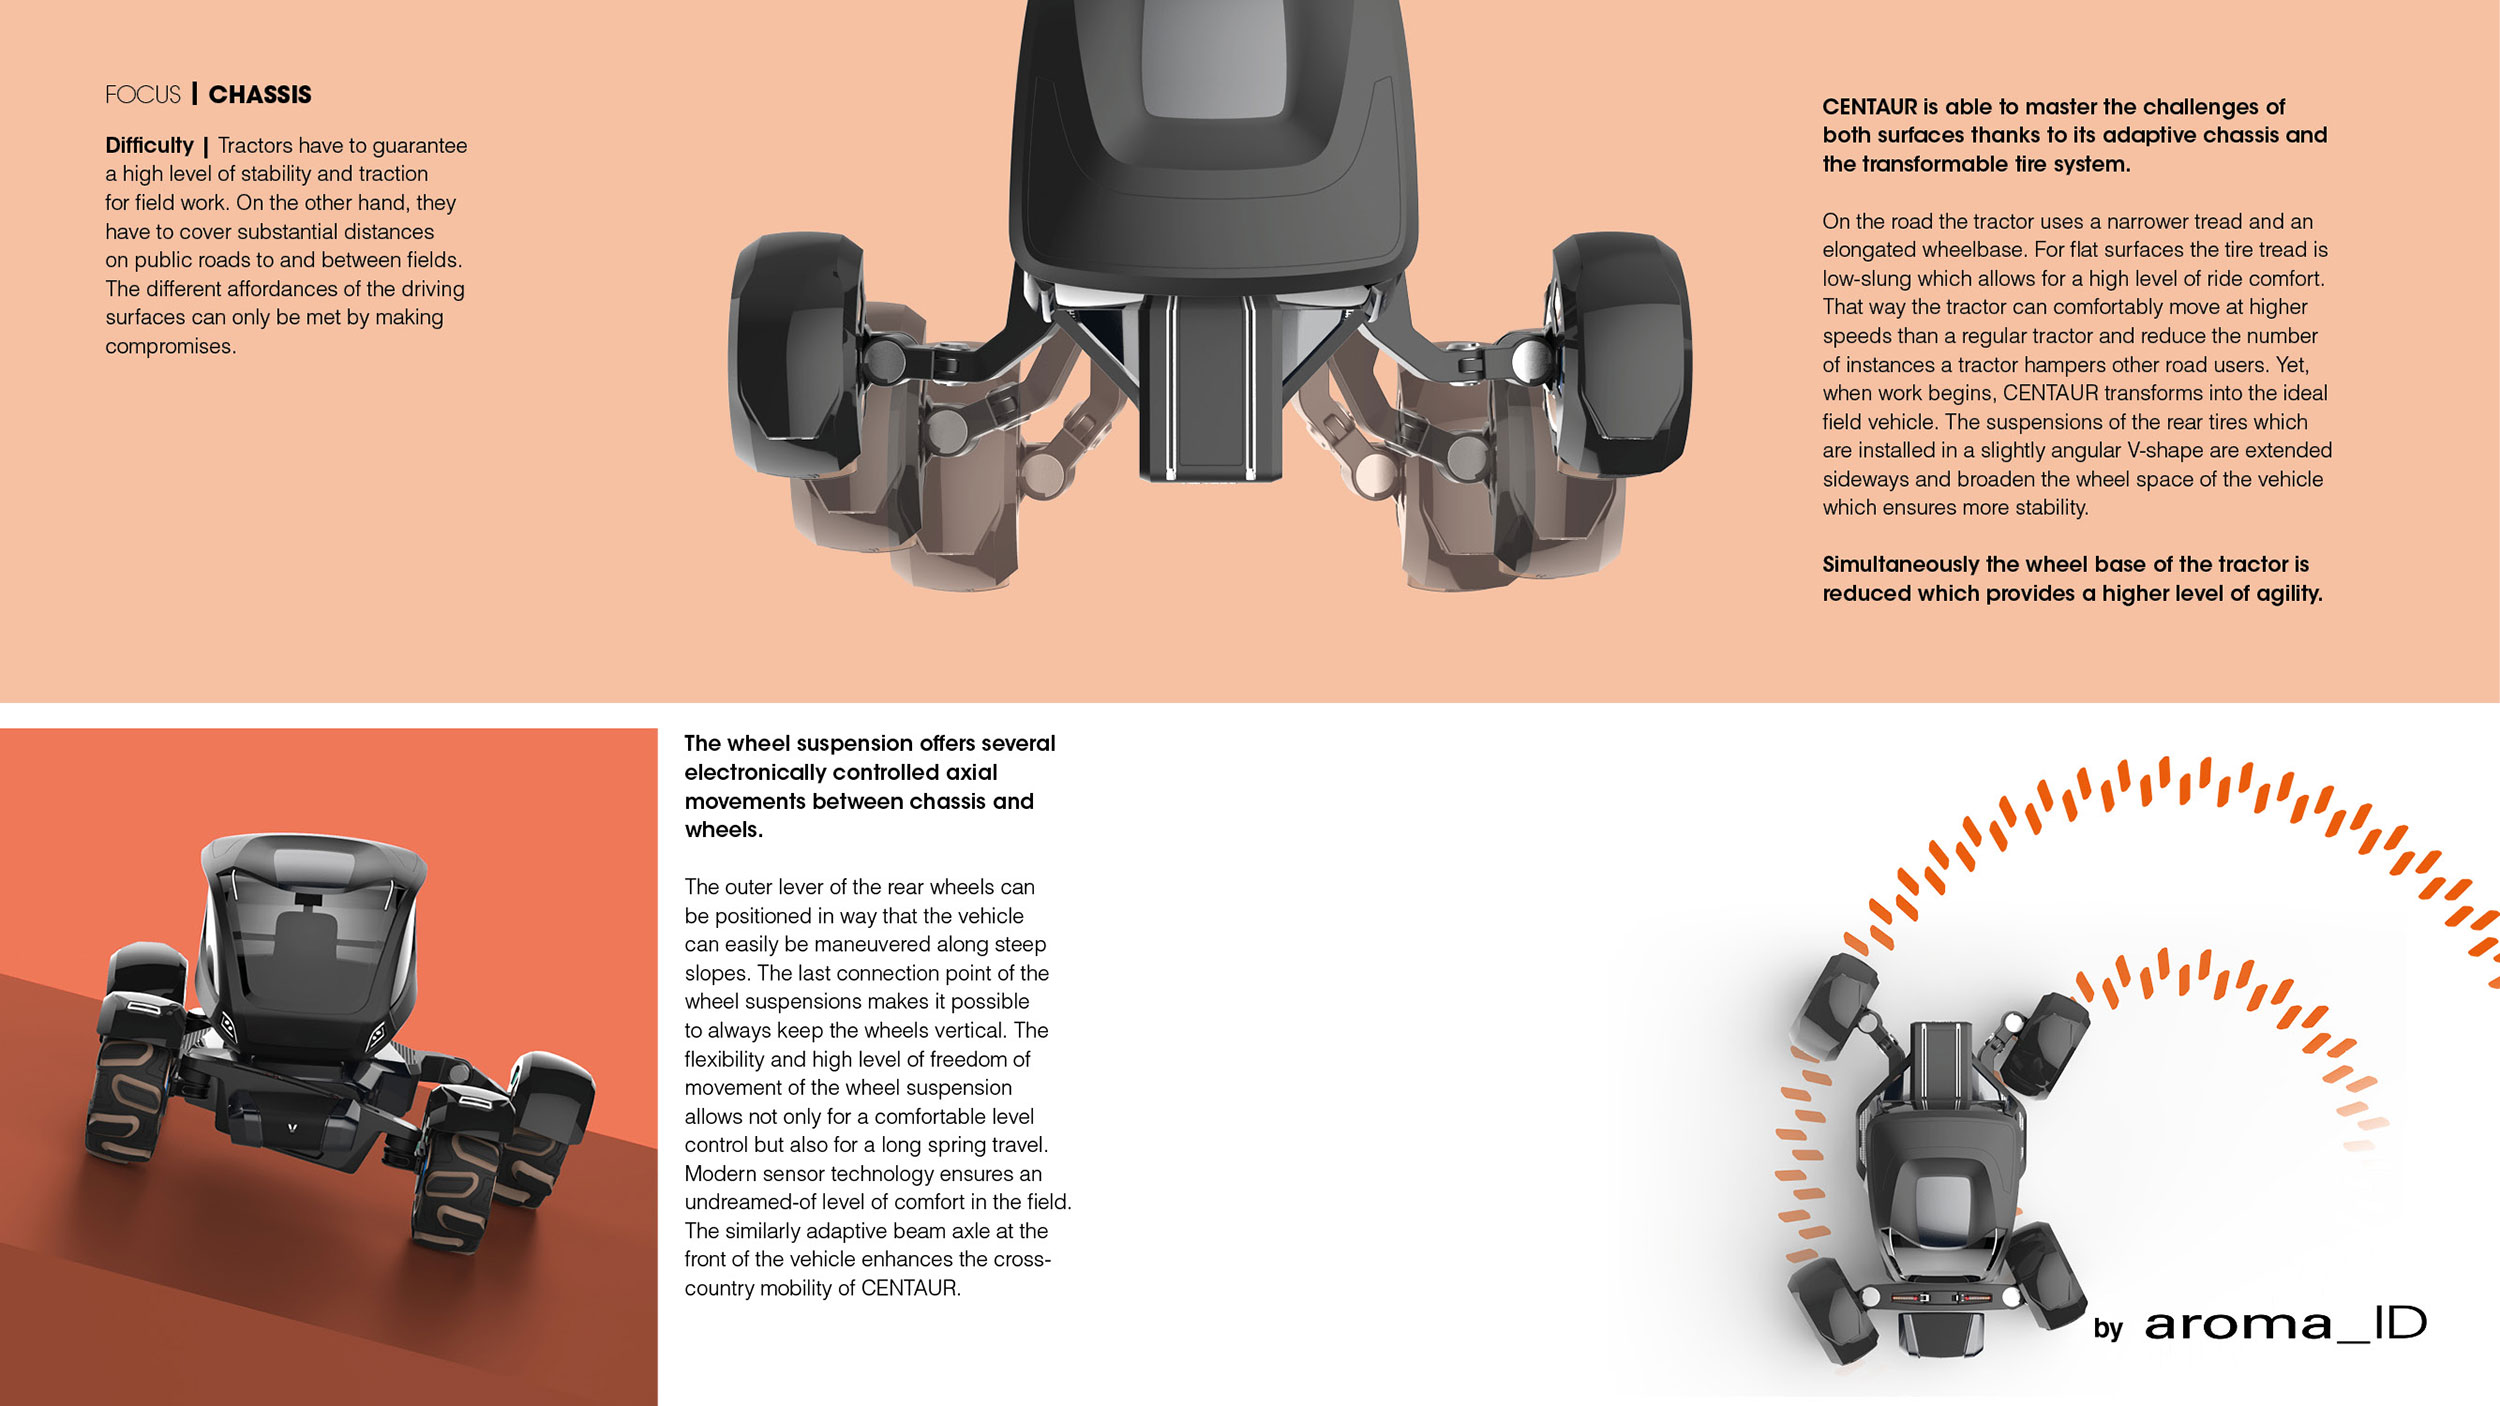 Valtra_Designchallenge_Concept_CENTAUR_by_aroma_ID_4